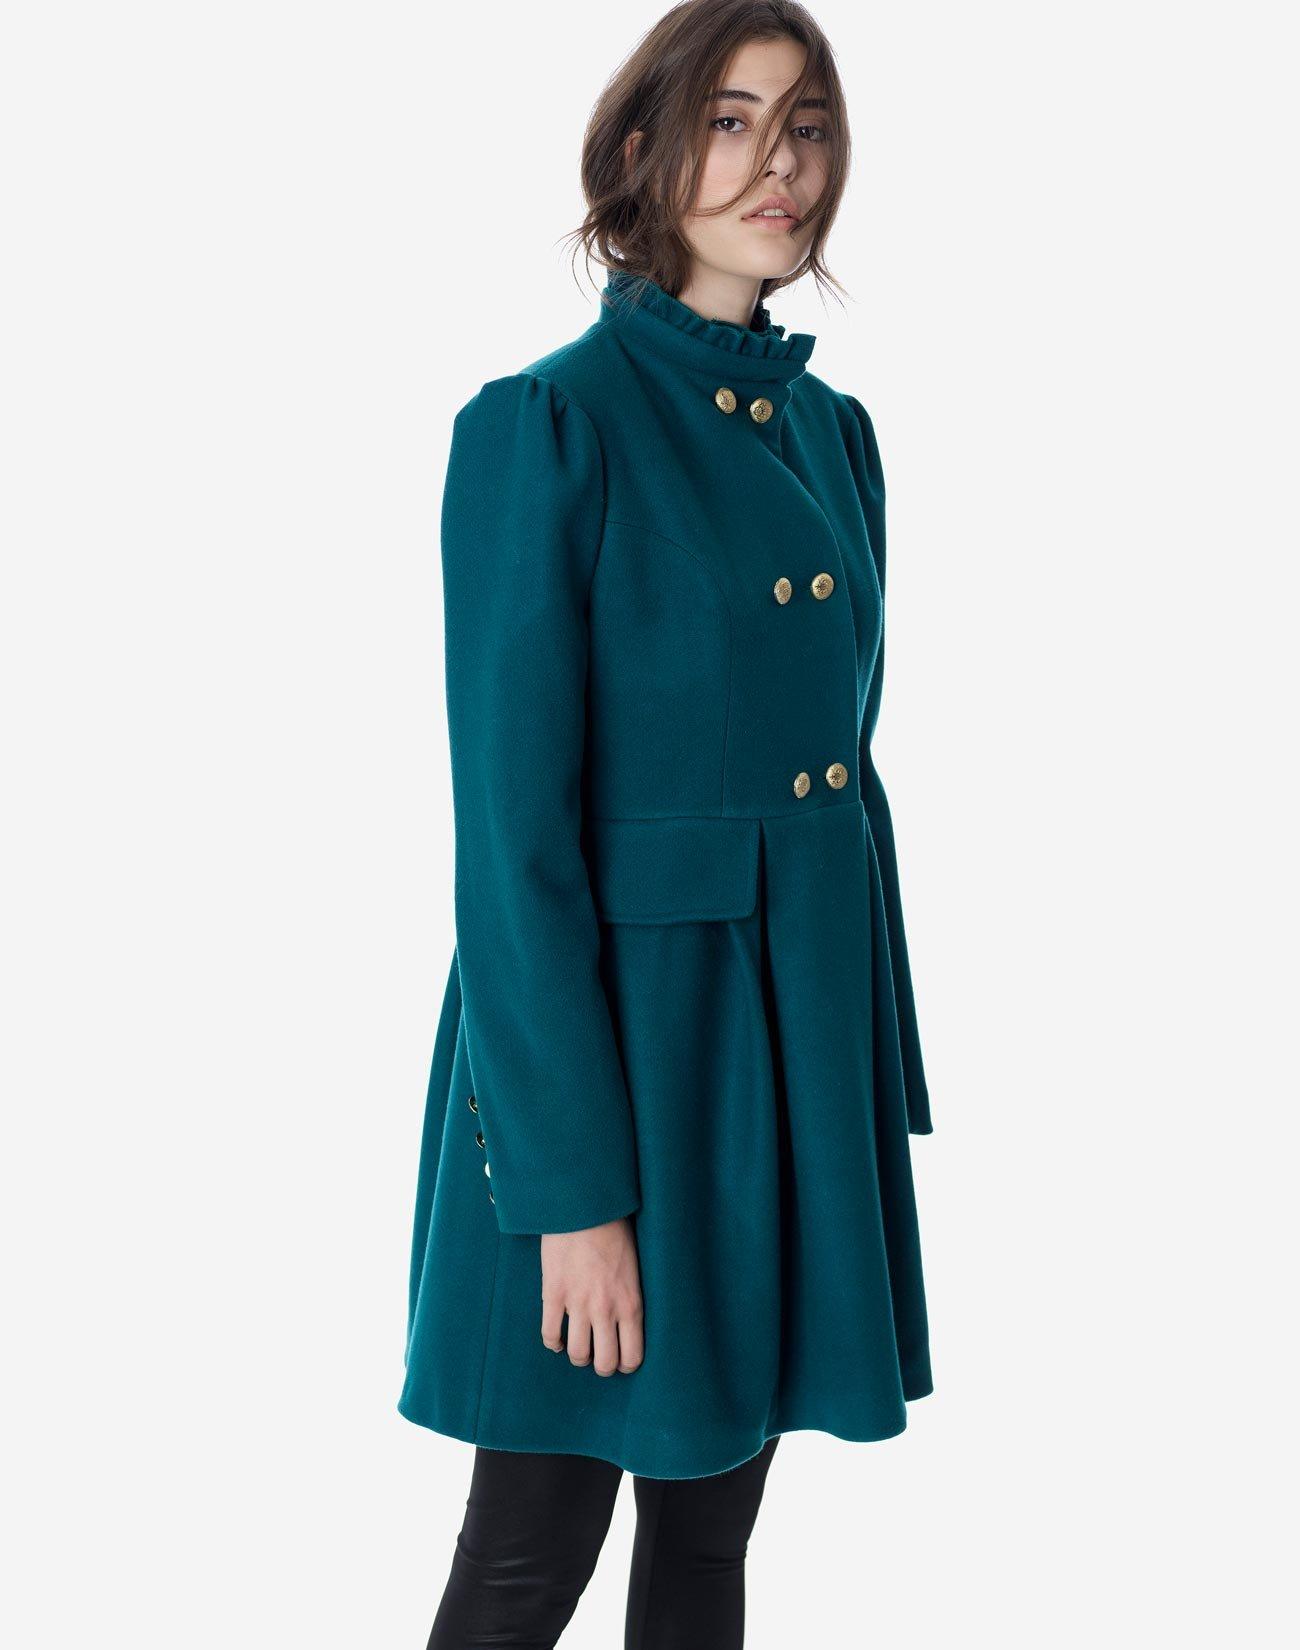 Coat with high ruffle collar